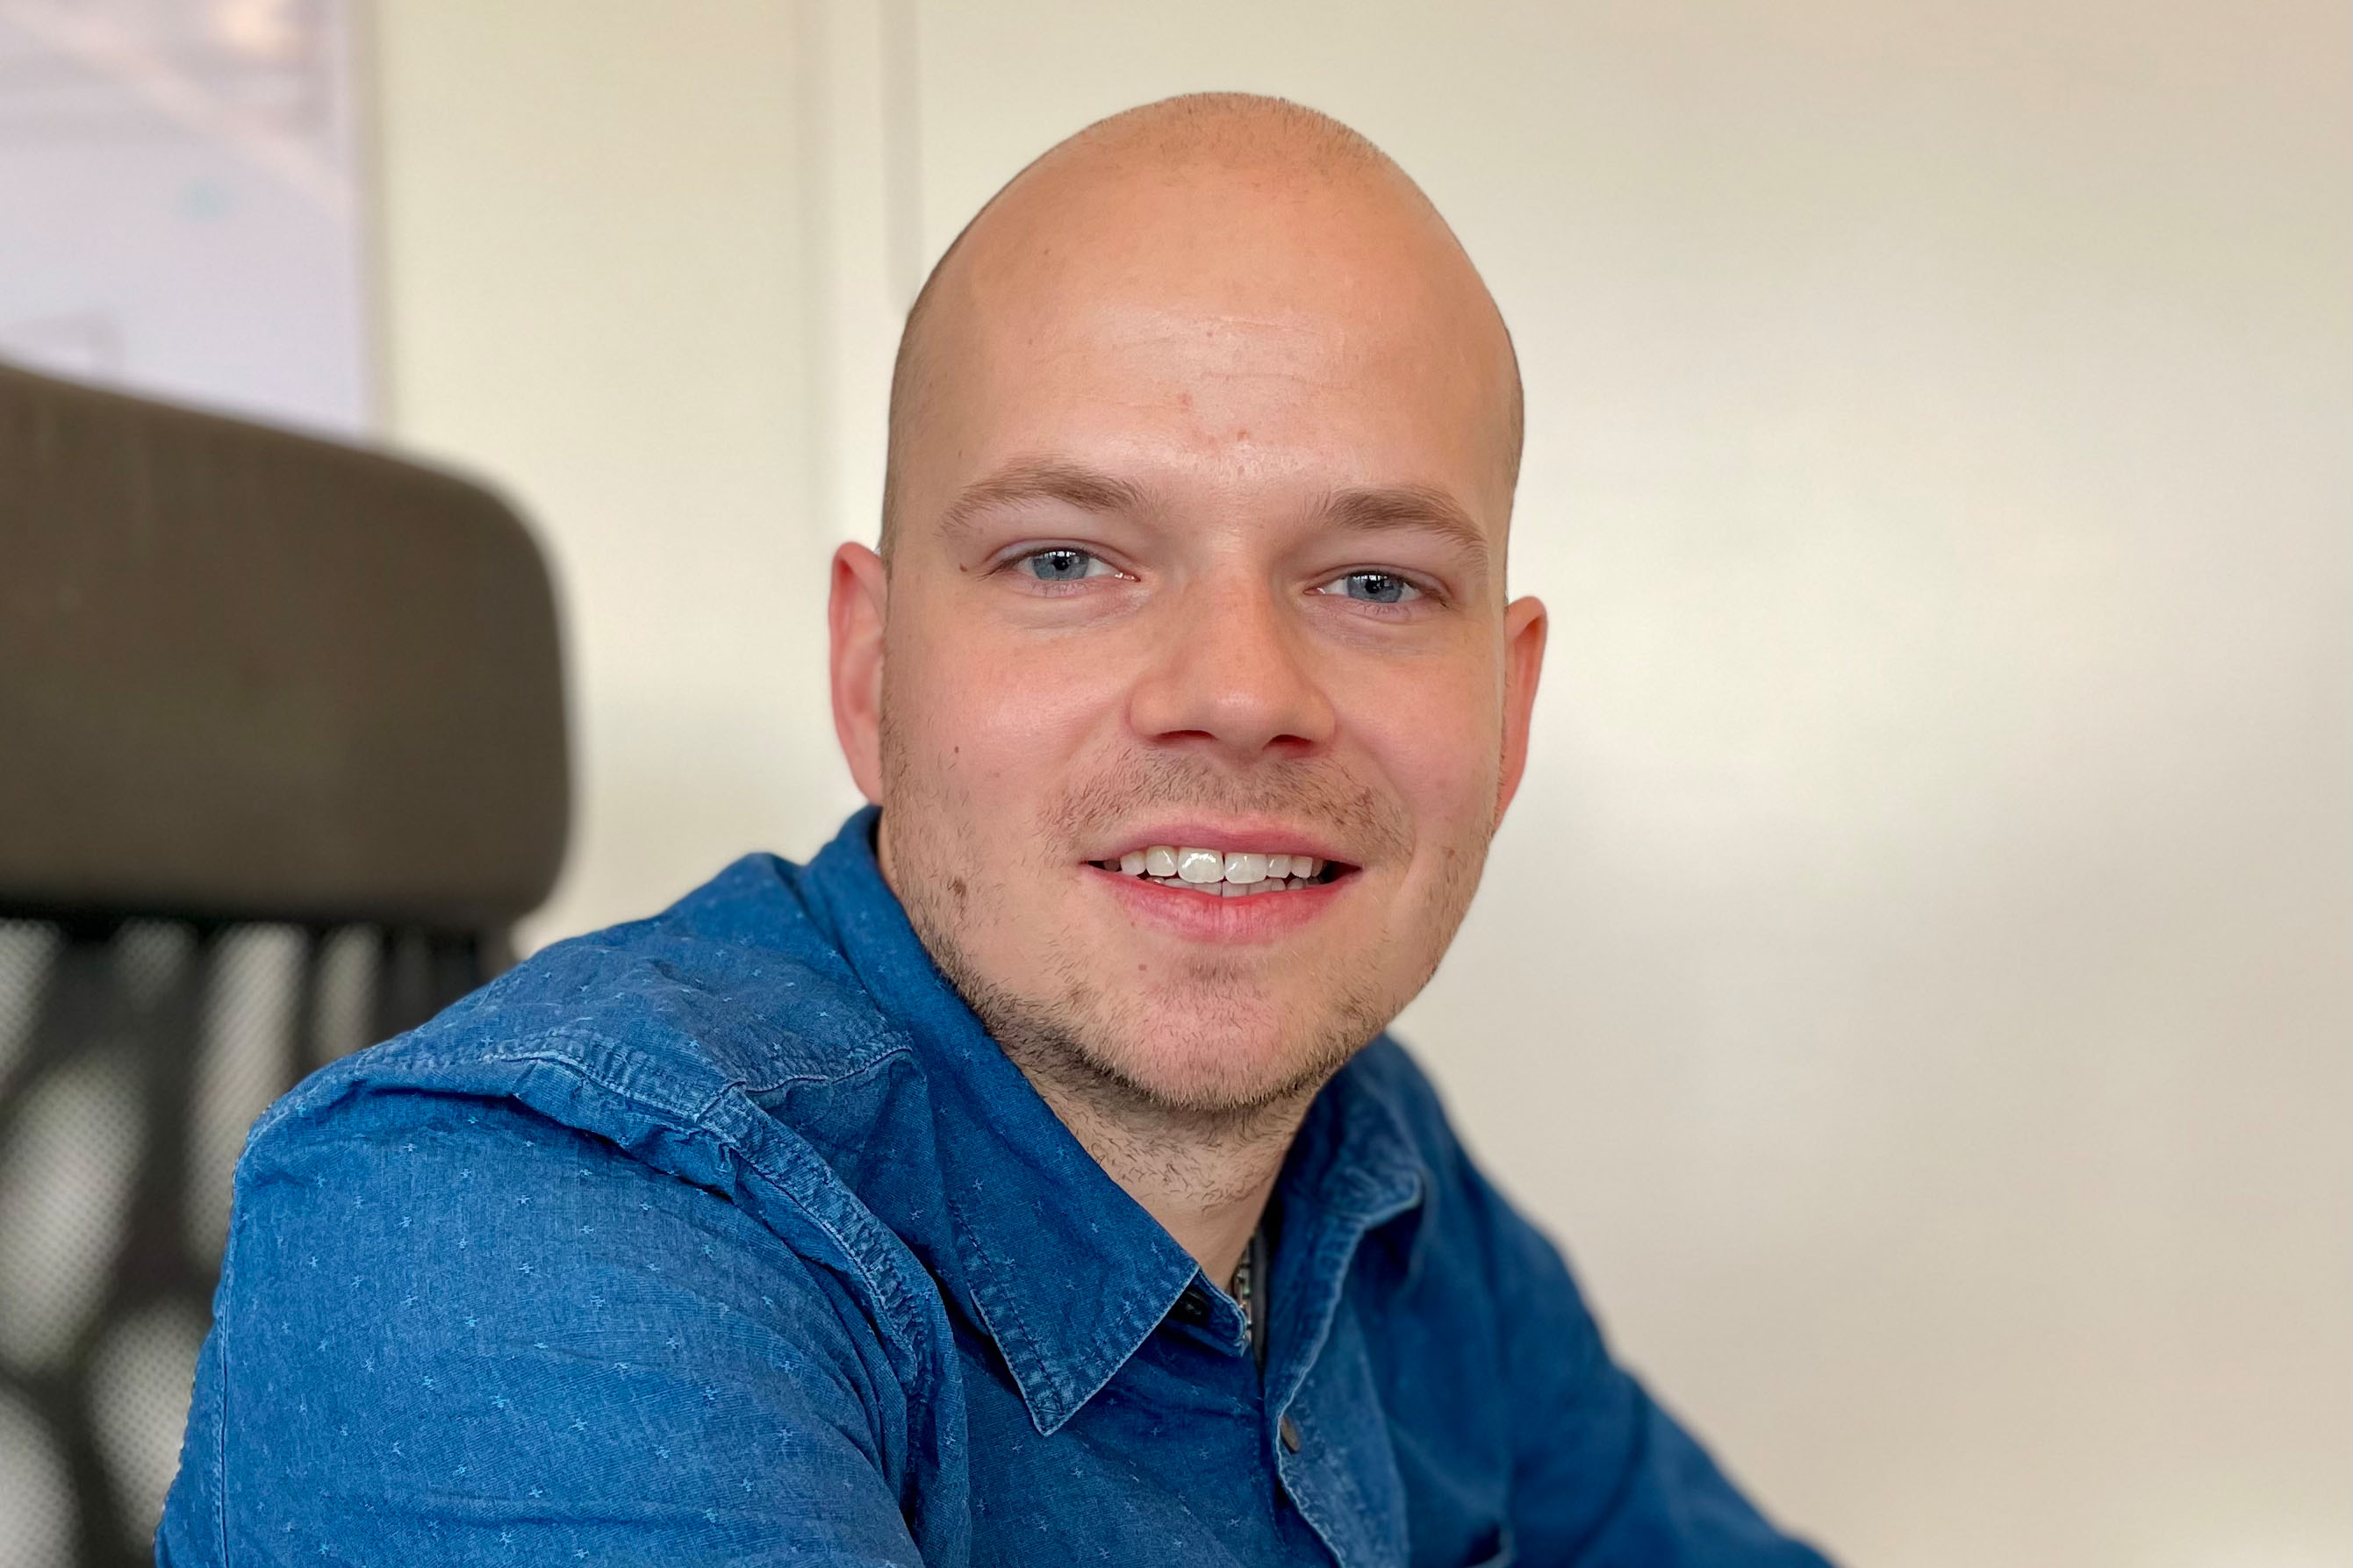 Lukas Aebersold